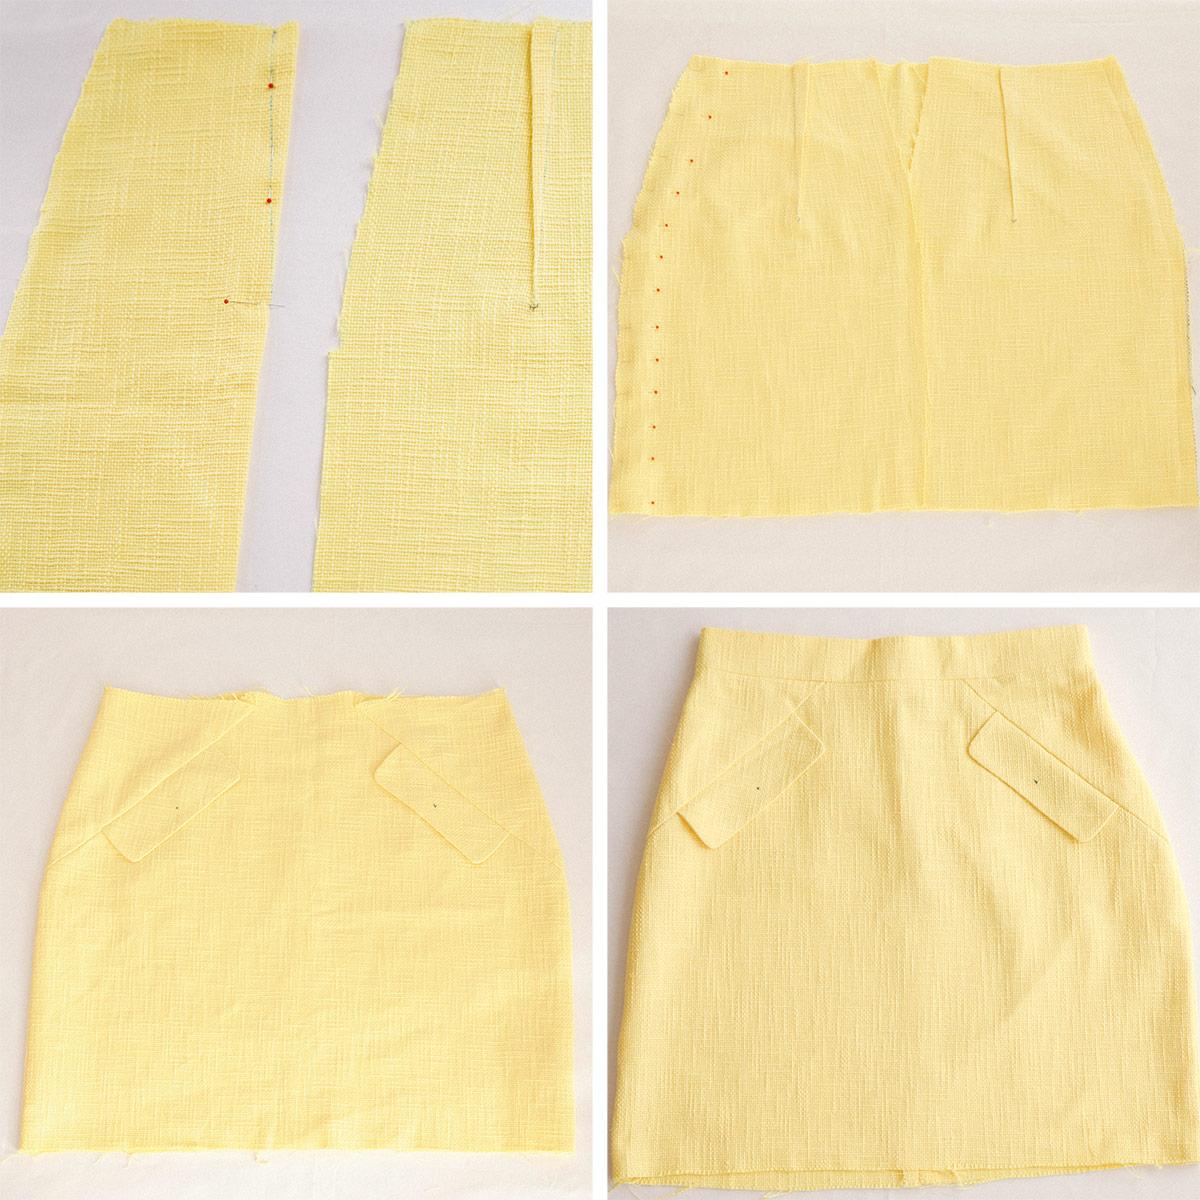 chanel-inspired-skirt-burda-thepetitecat-3